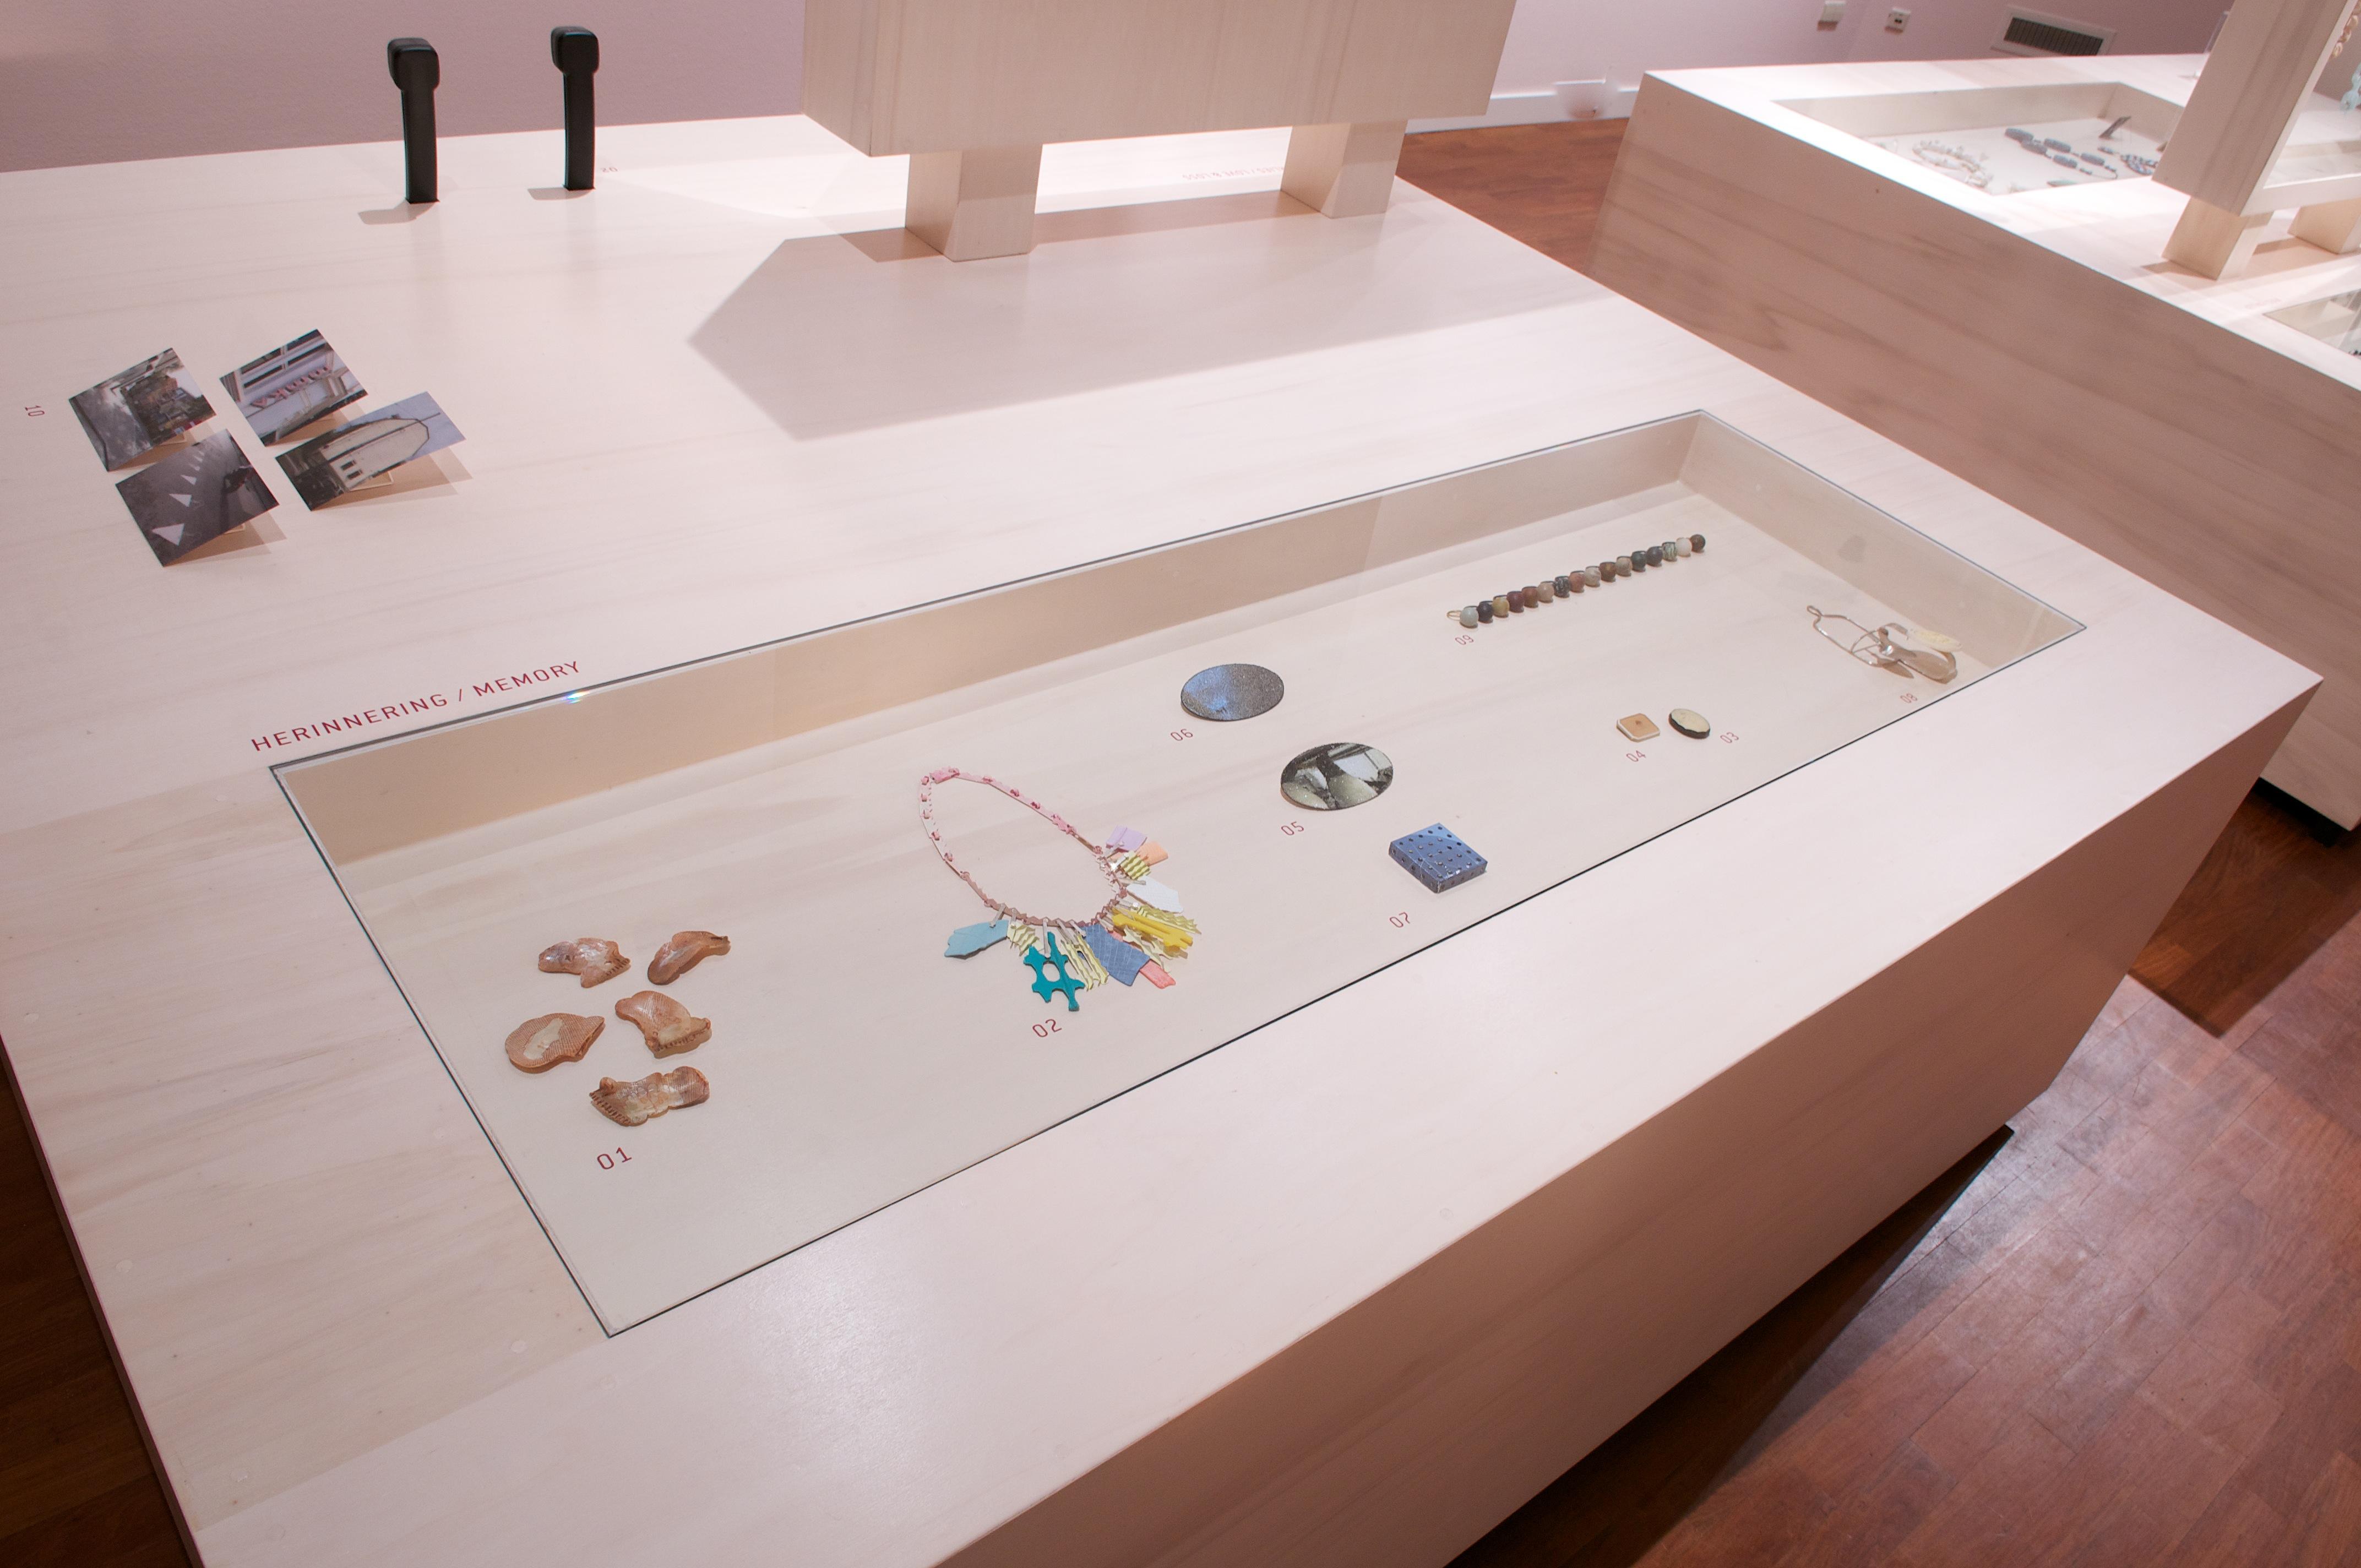 Ontketend, Museum voor Moderne Kunst Arnhem, 2011, tentoonstelling, vitrine